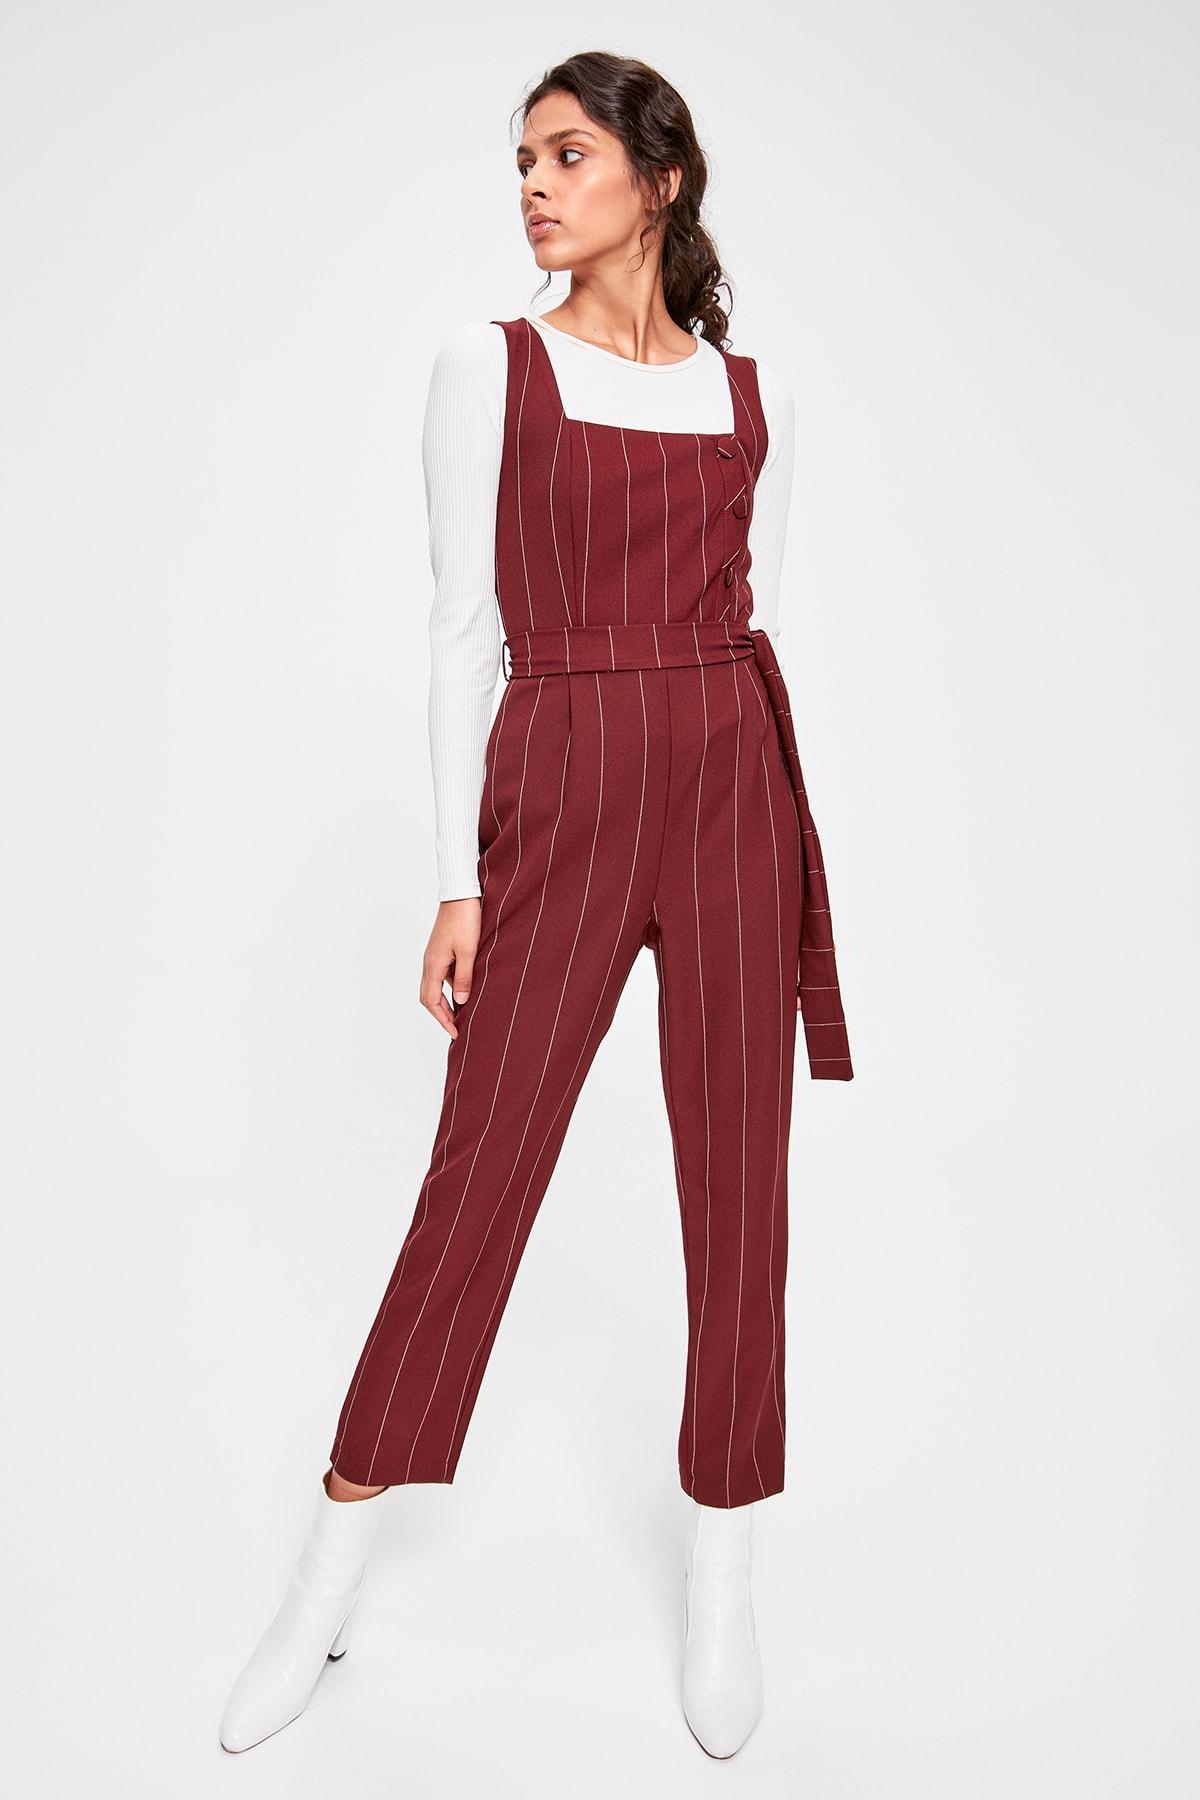 Trendyol Burgundy Belted Striped Jumpsuit TWOAW20TU0023